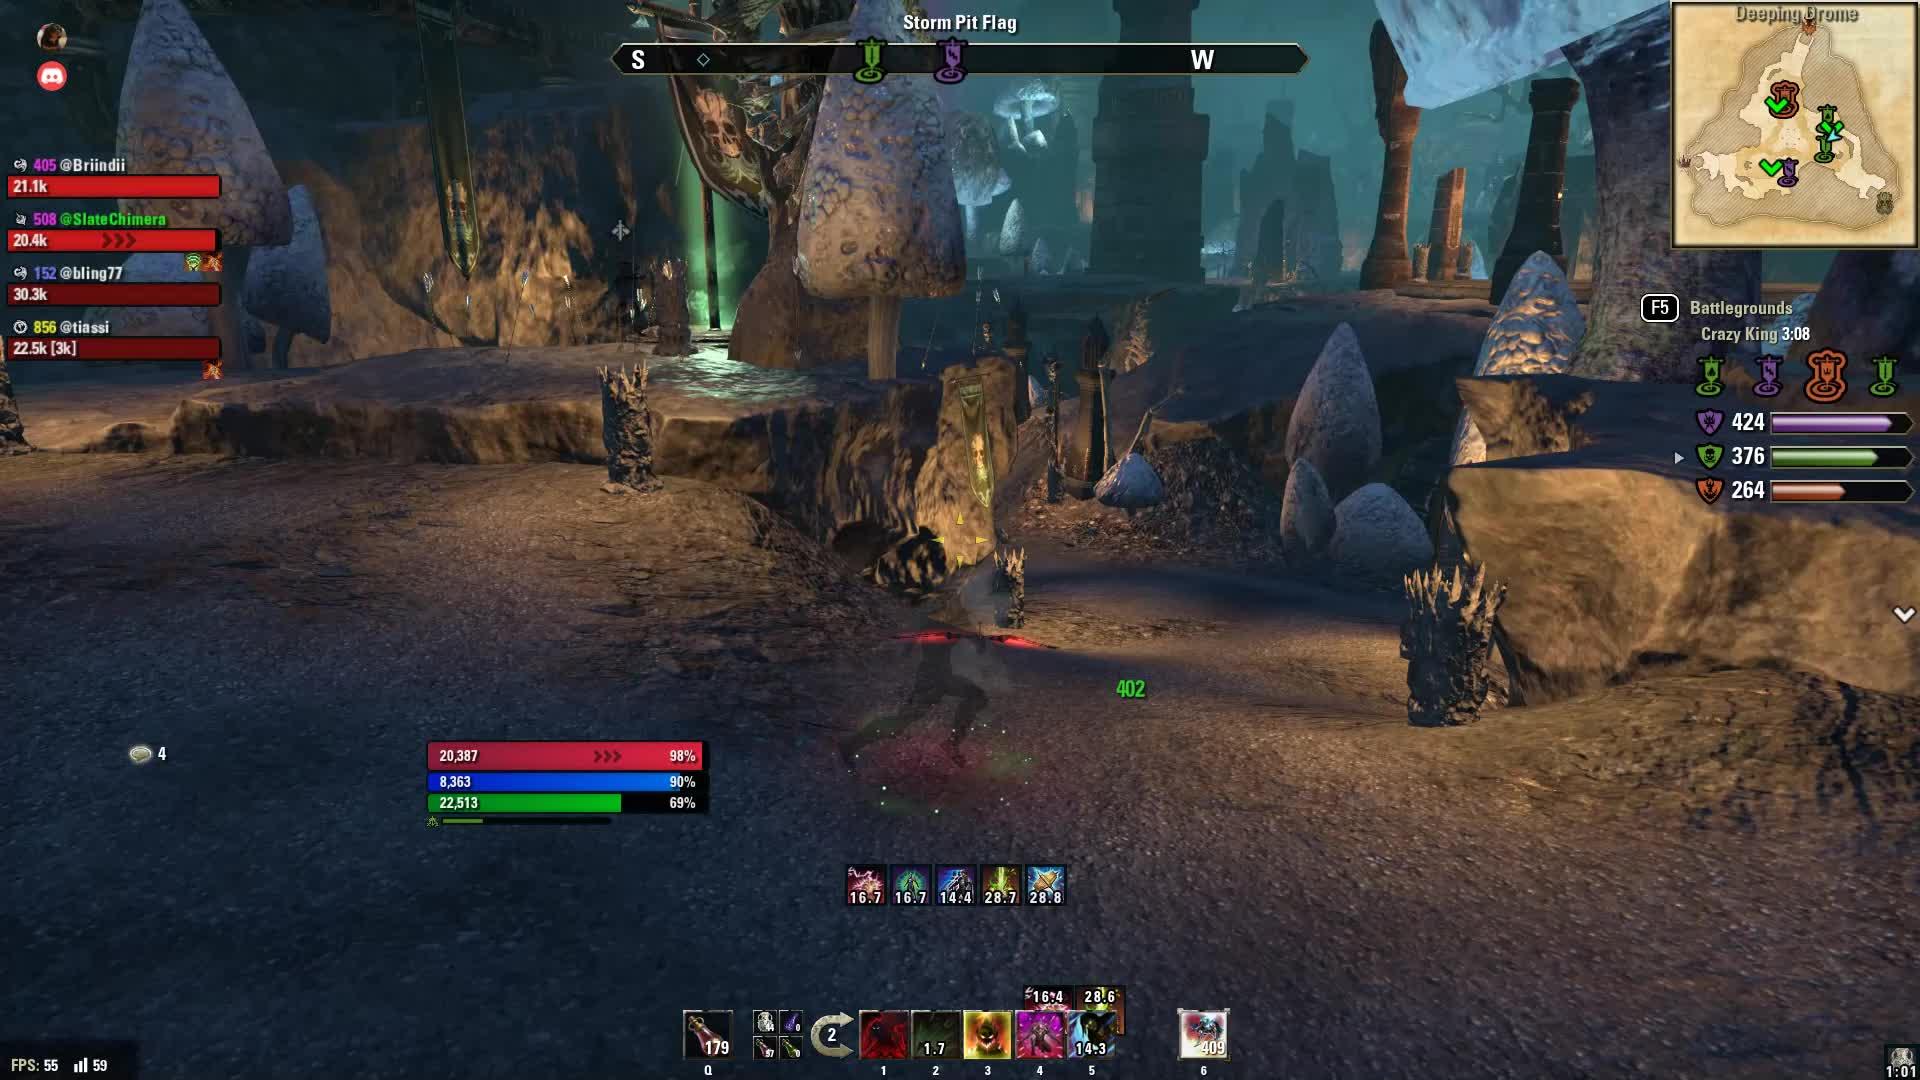 elderscrollsonline, Elder Scrolls Online 2019.05.04 - 23.15.29.09.DVR Trim GIFs